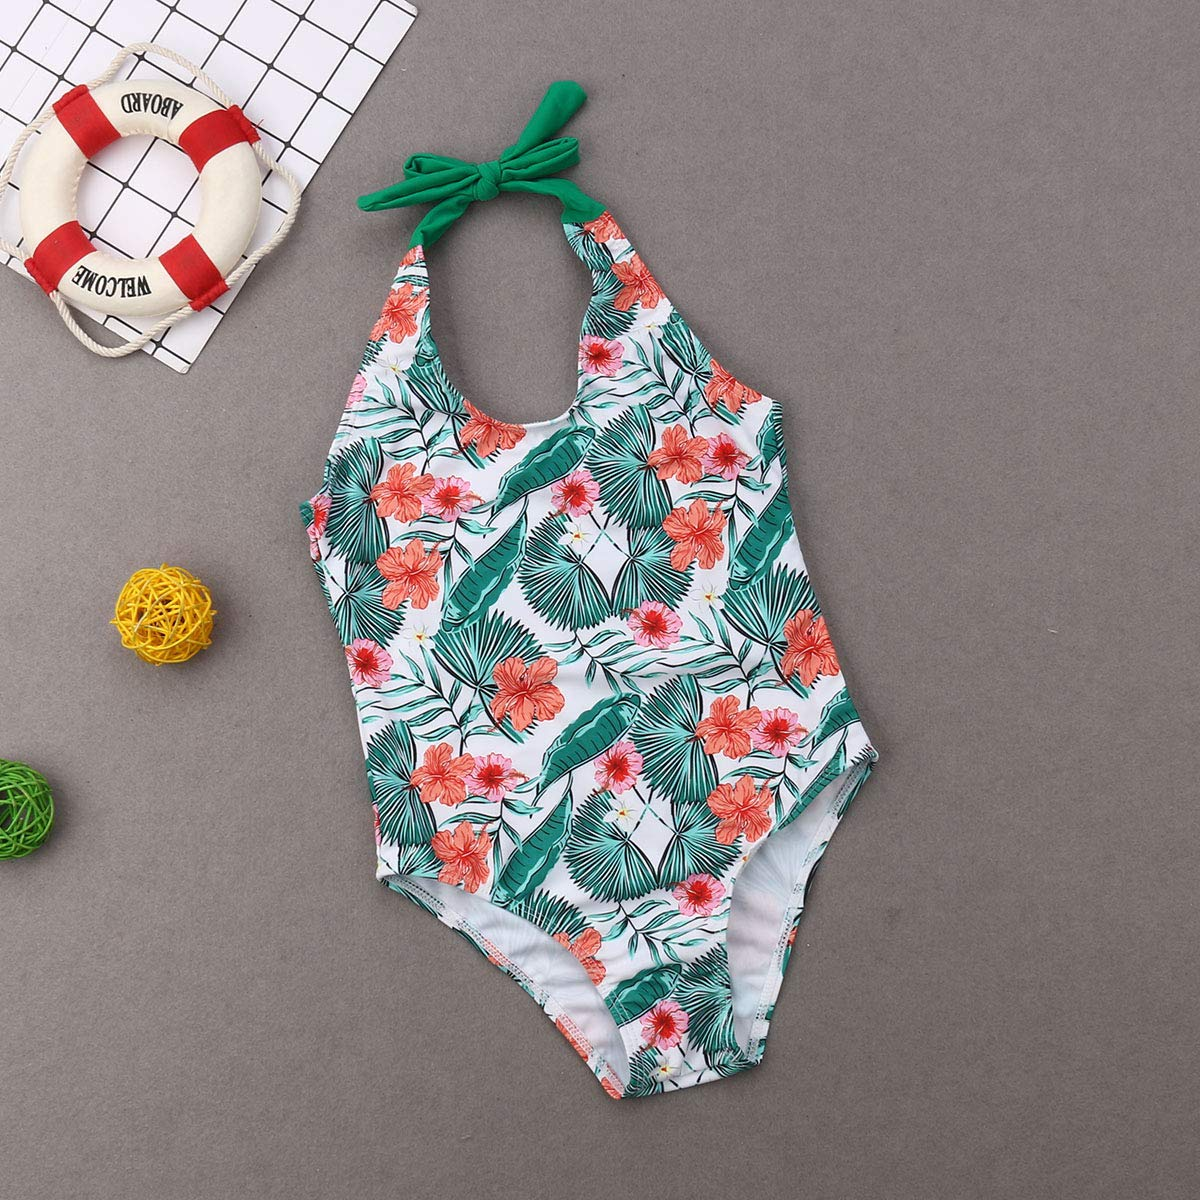 Family Matching Swimsuit Mother Father Kids One Piece Print Monokini Swimwear Beachsuit Bathing Suit